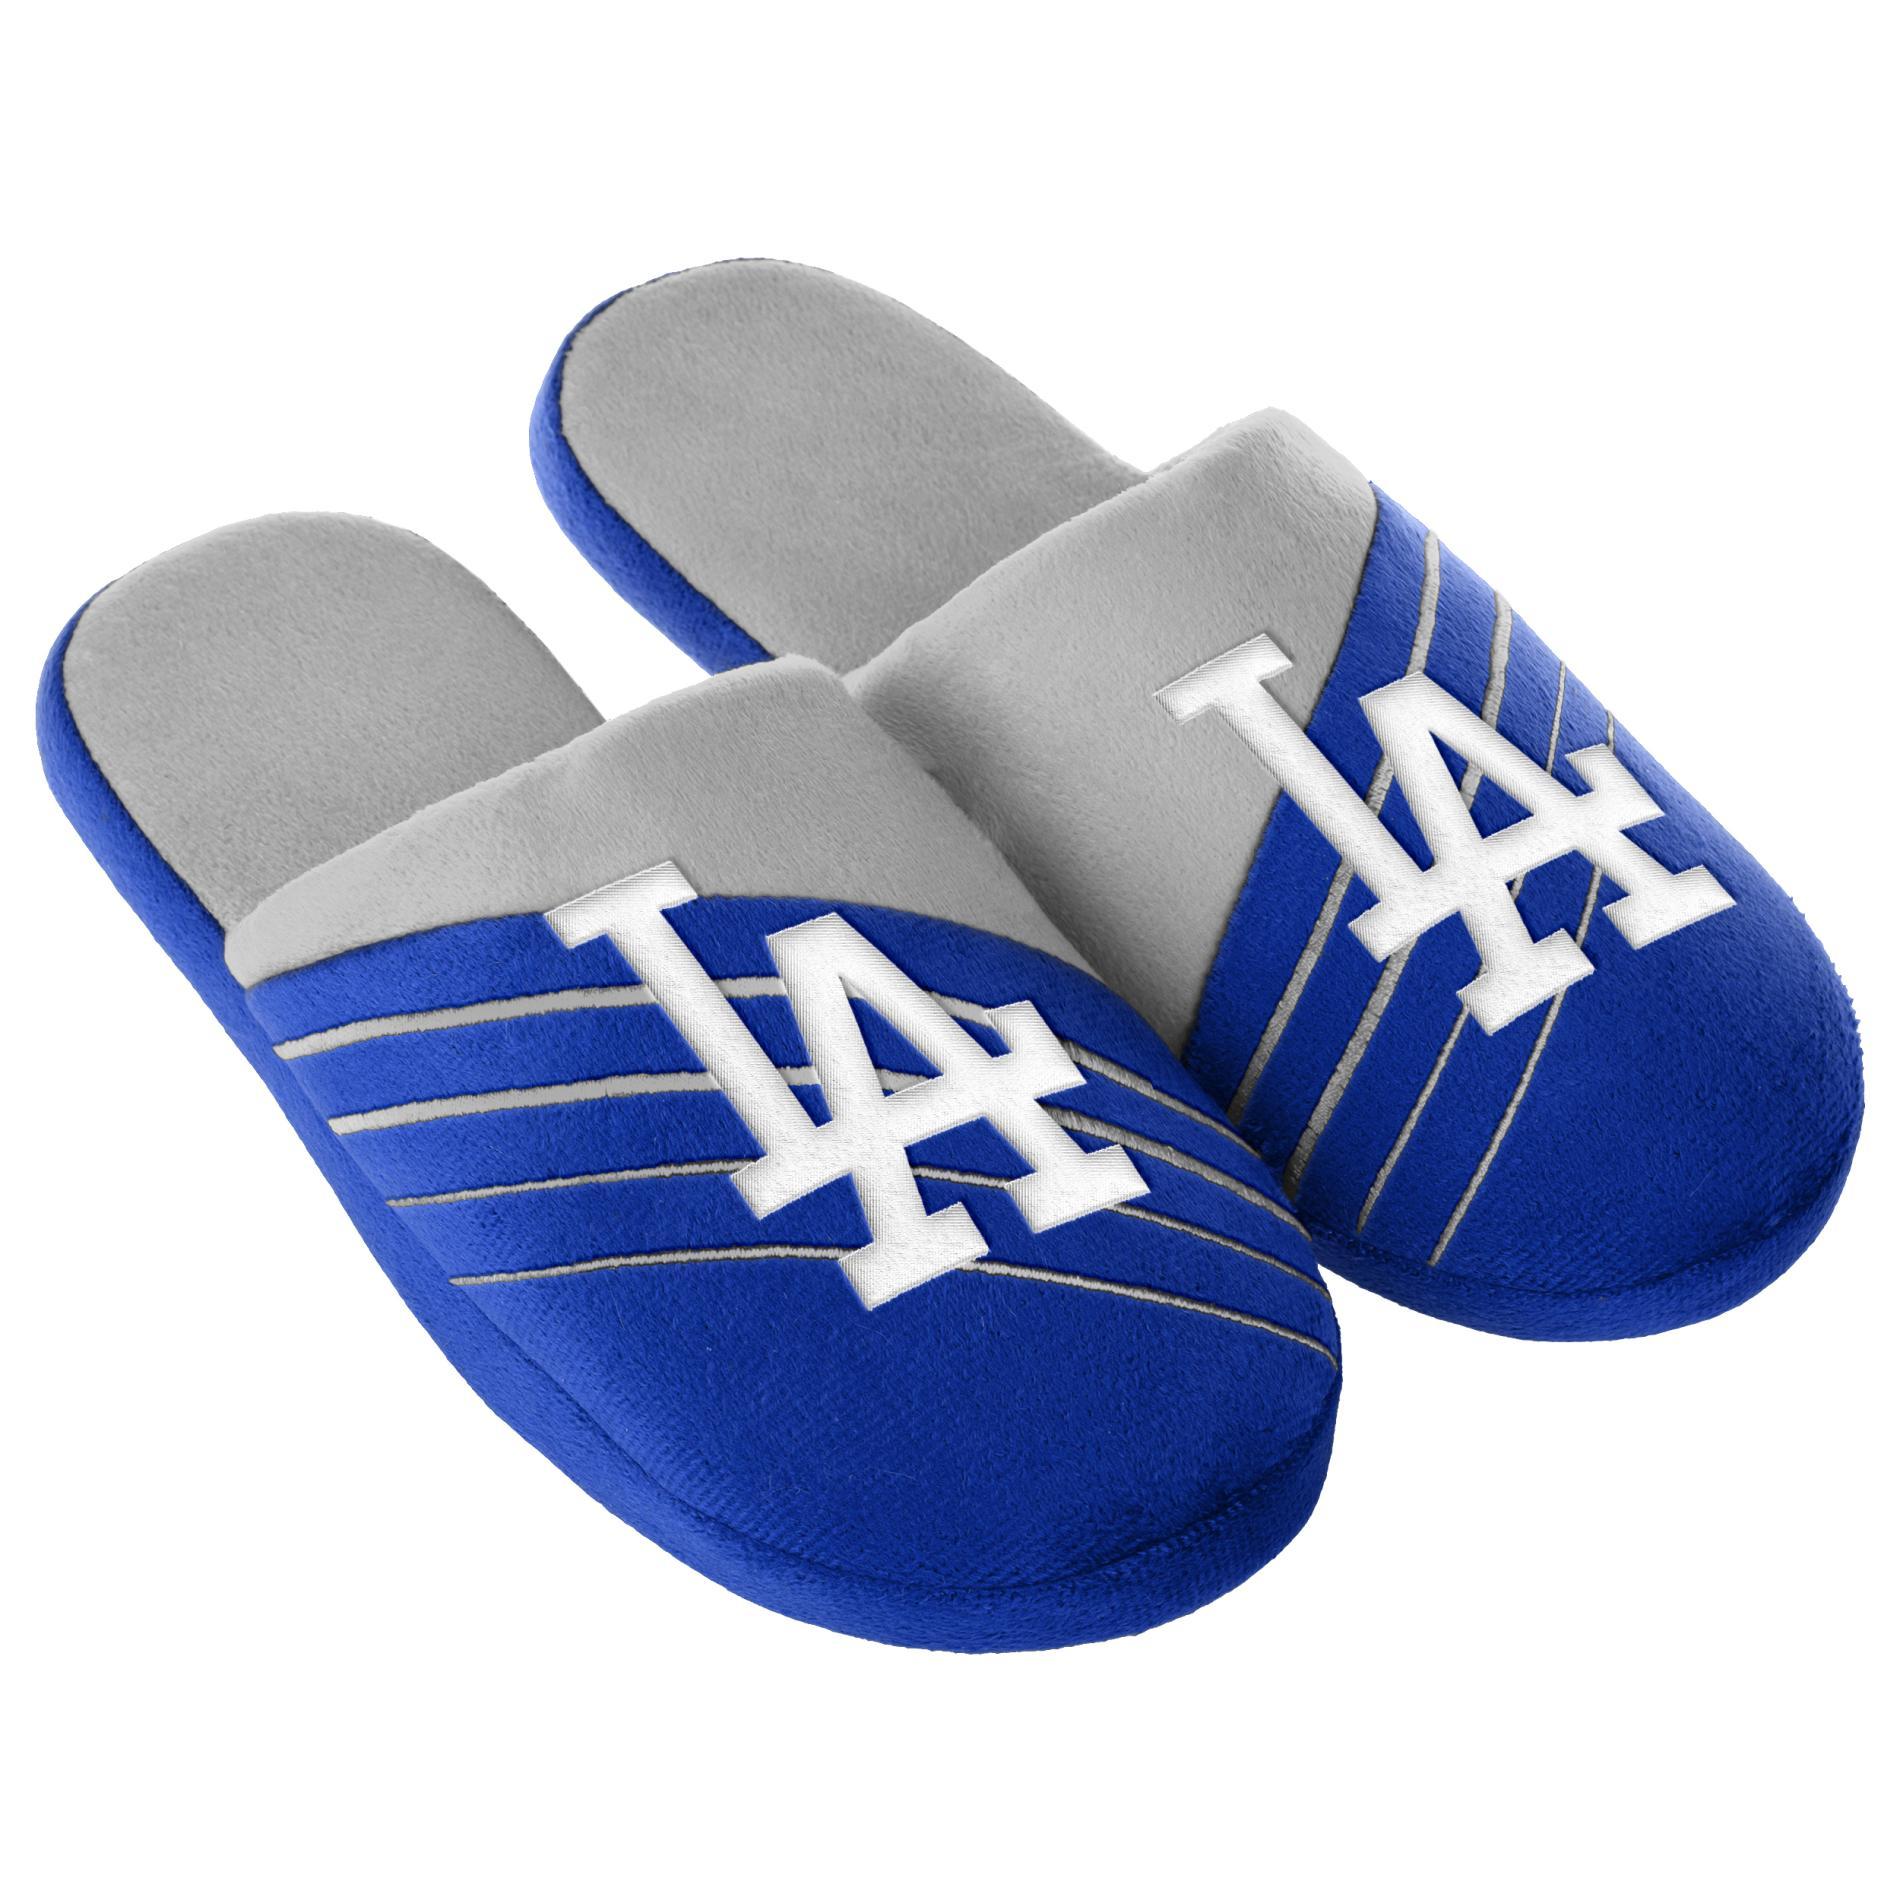 MLB Men's Los Angeles Dodgers Blue/Gray Slippers PartNumber: 046VA91748012P MfgPartNumber: SLPMB16BLGBOL